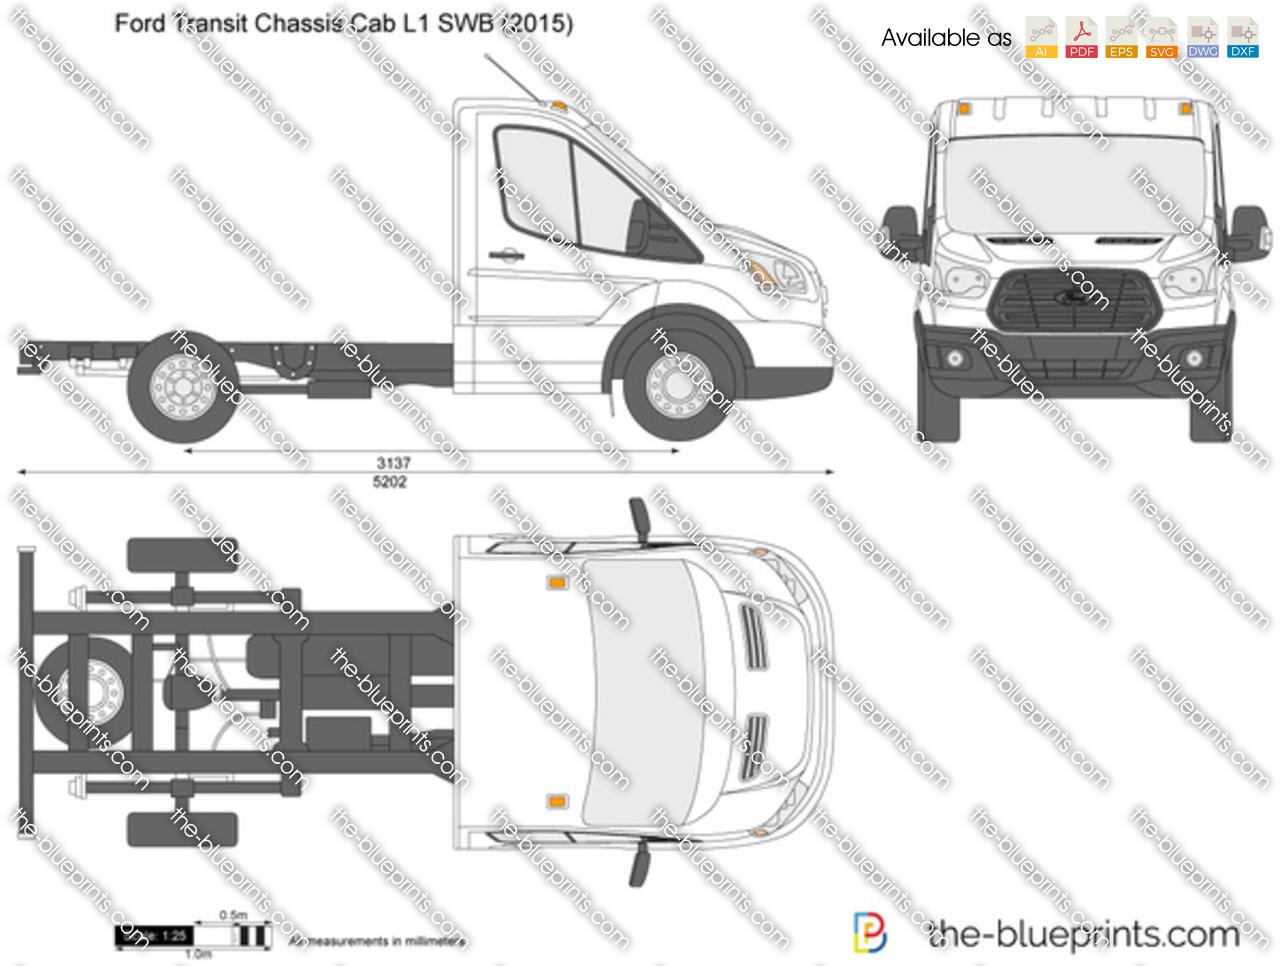 Ford Transit Chassis Cab L1 SWB 2014